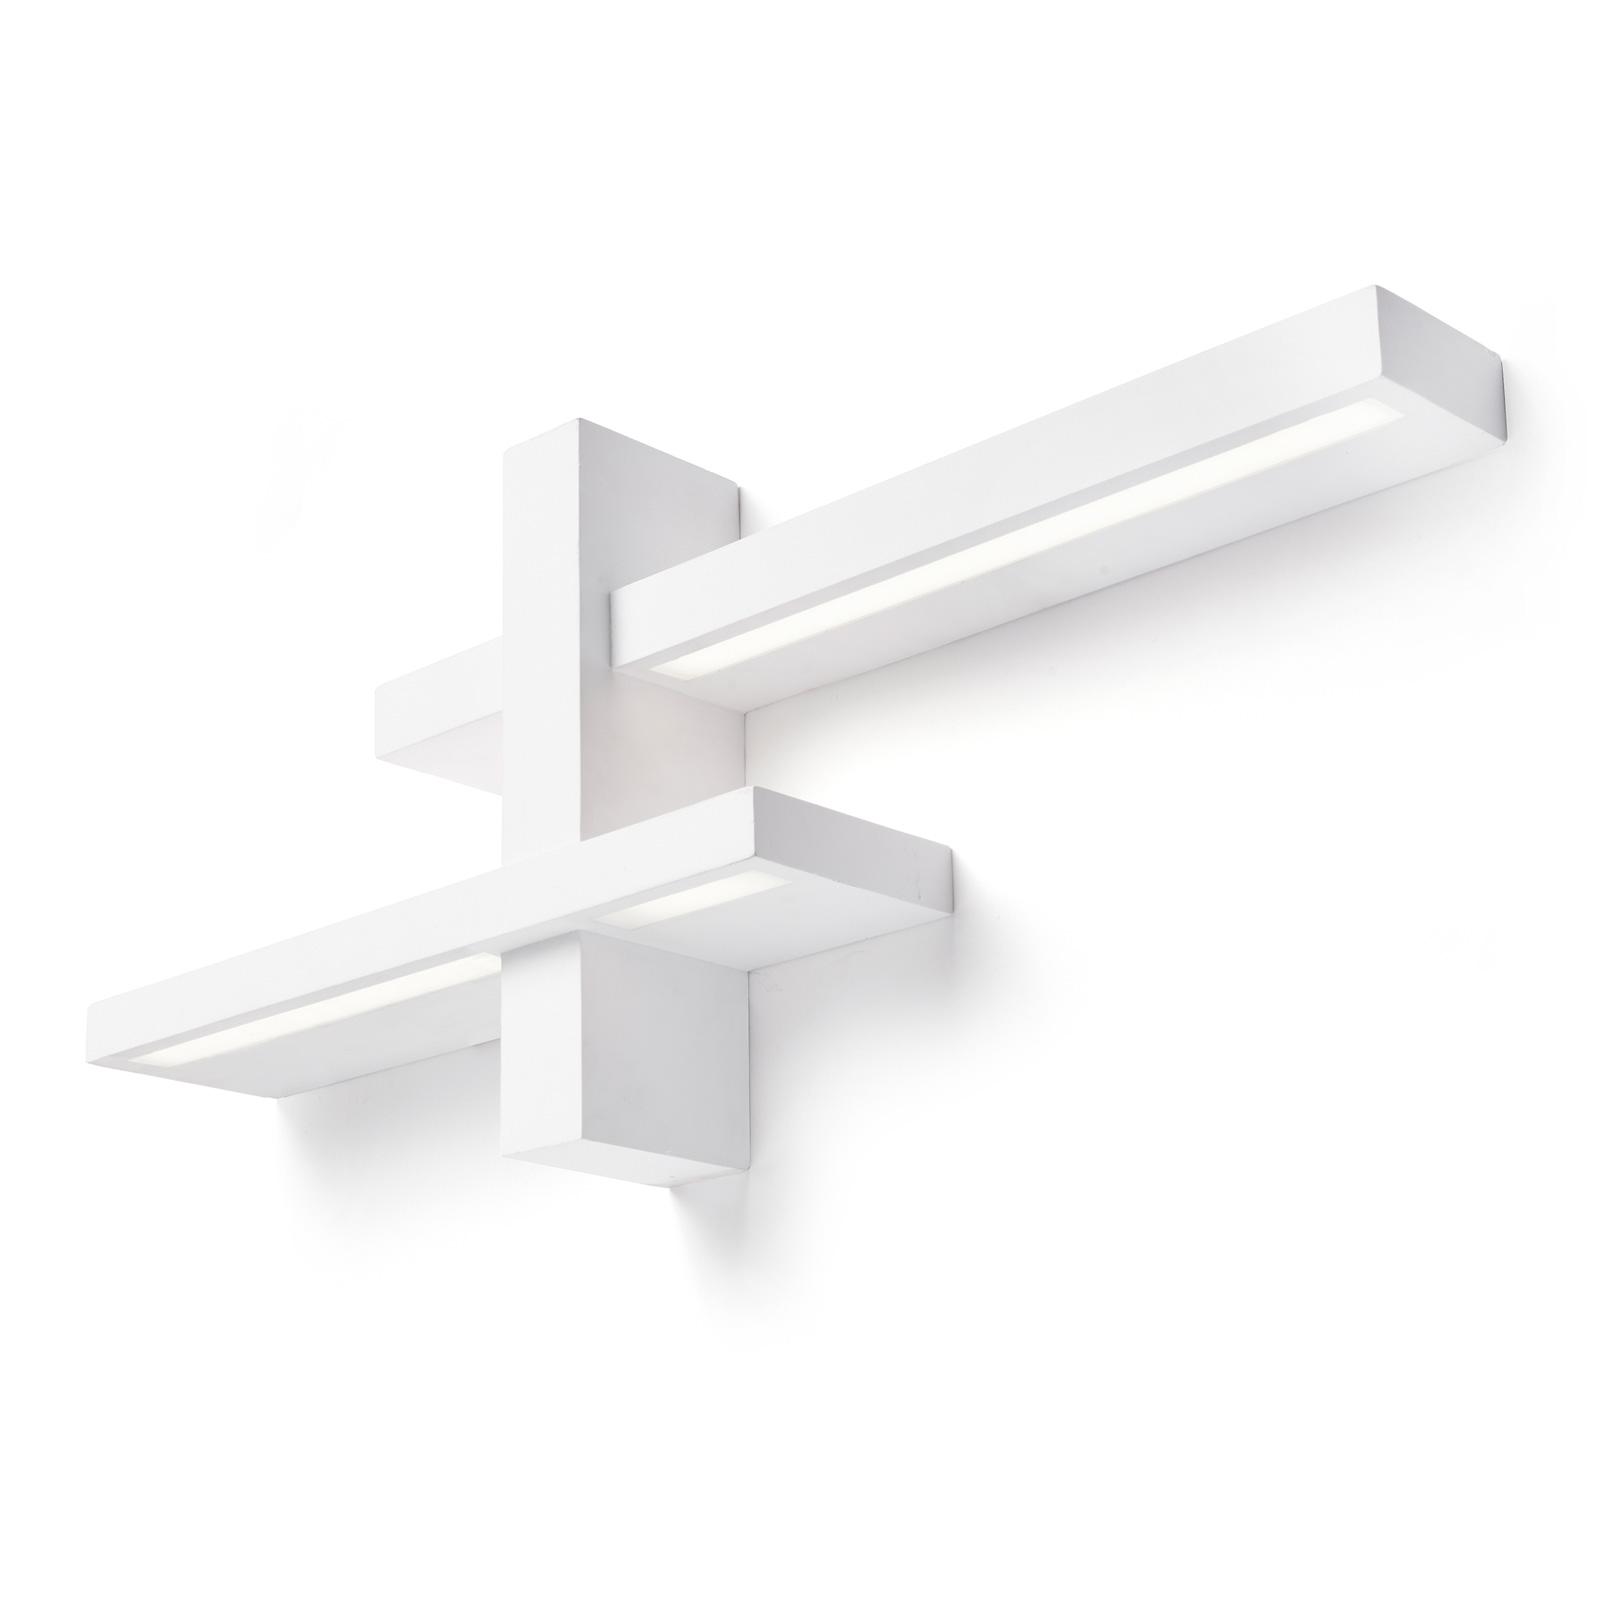 LED wandlamp Magnesia T286 60 cm x 27 cm